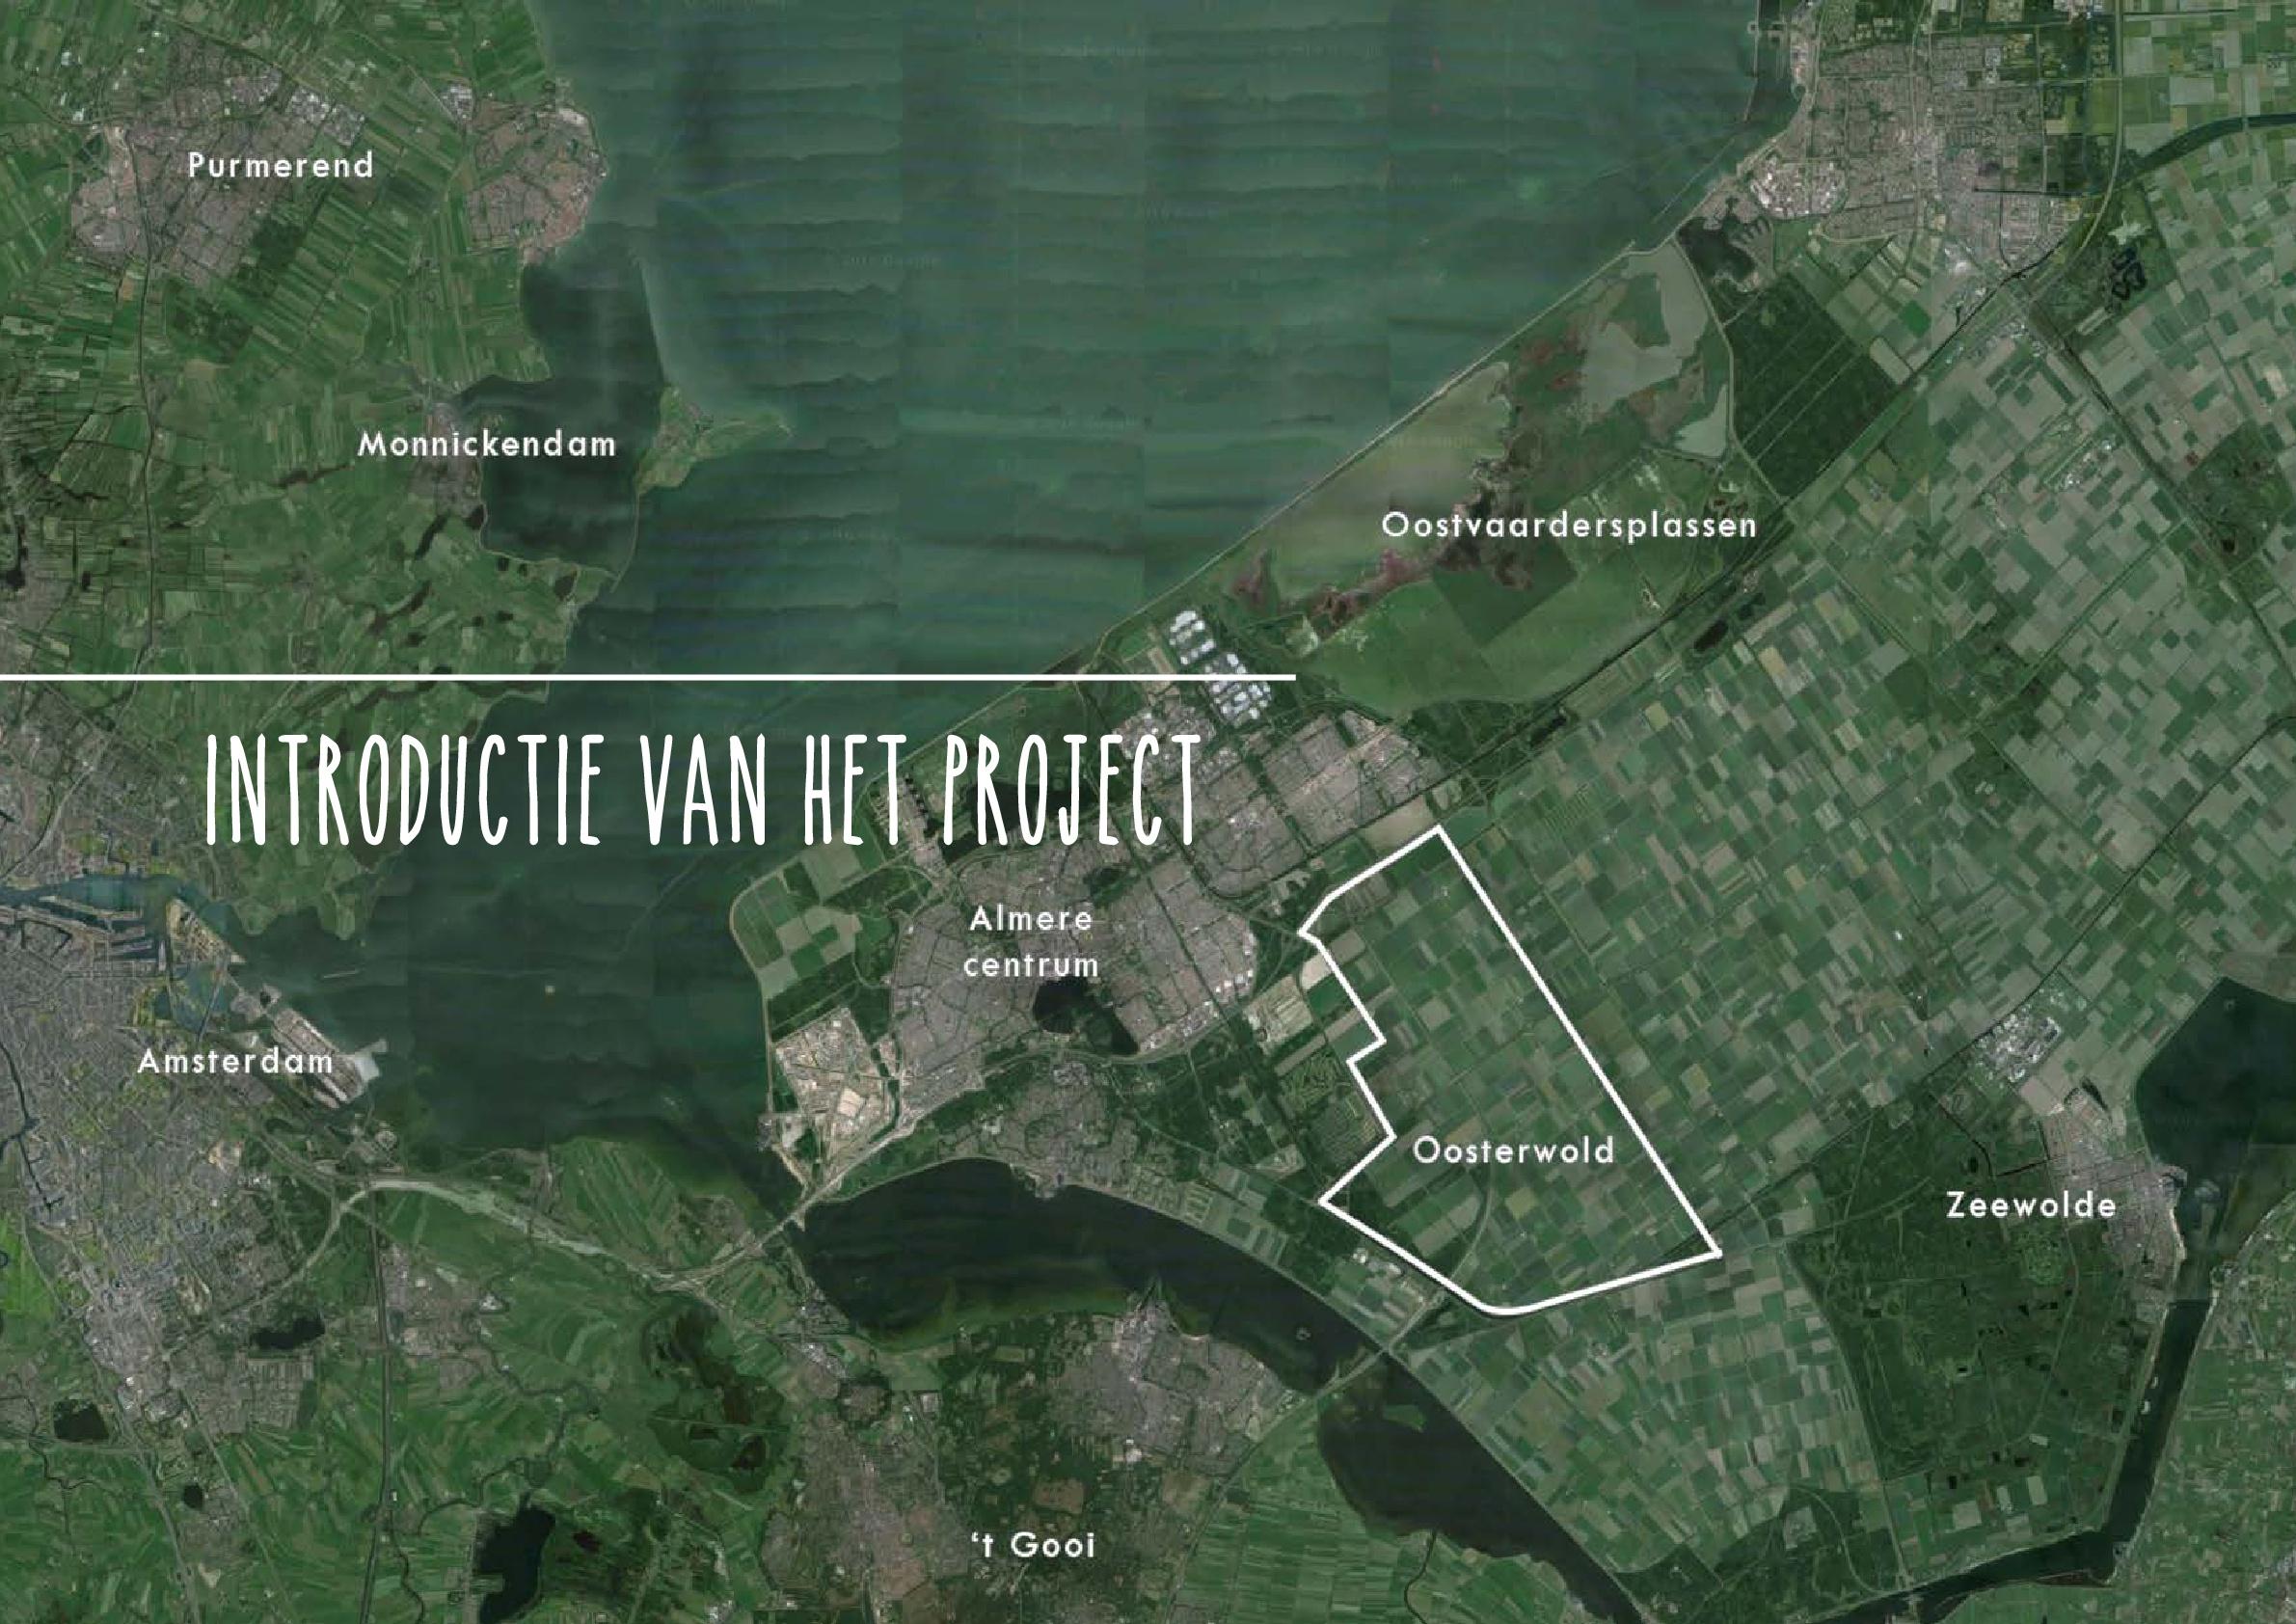 projectverslag-v2.8-inlever-006